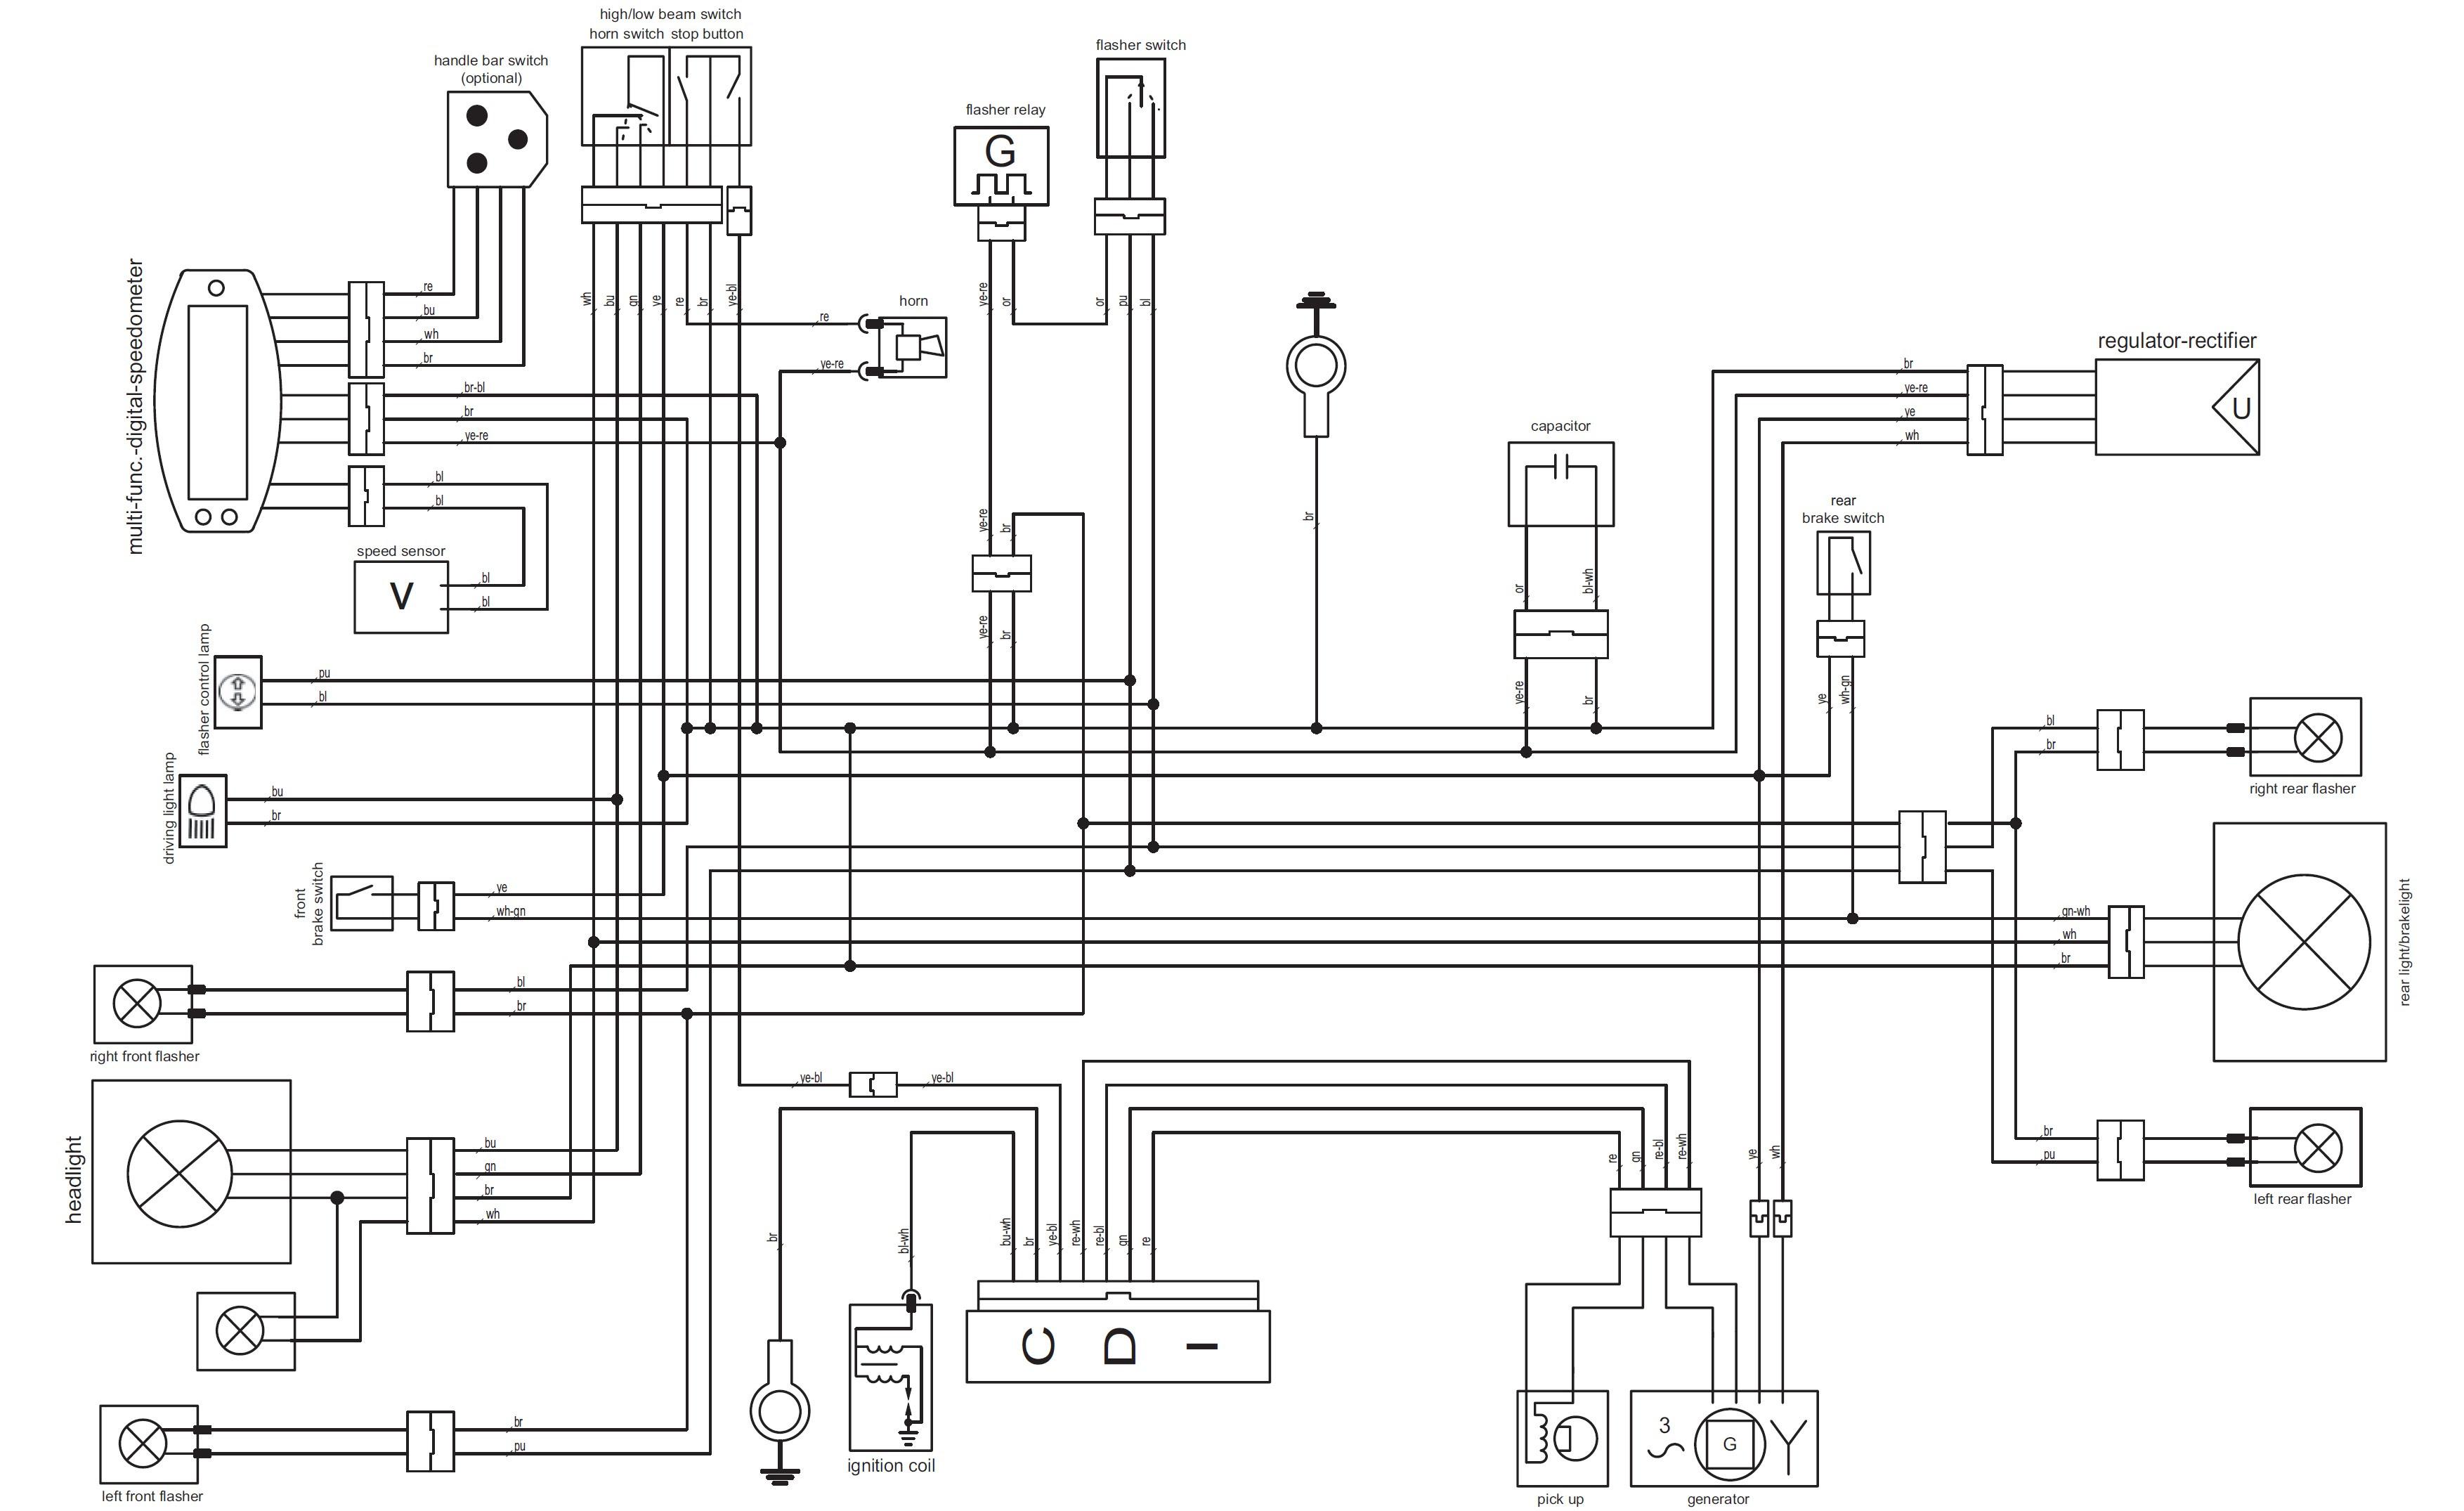 Ktm Exc Headlight Wiring Diagram Jeep Compass Fuse Box 800sss Losdol2 Jeanjaures37 Fr